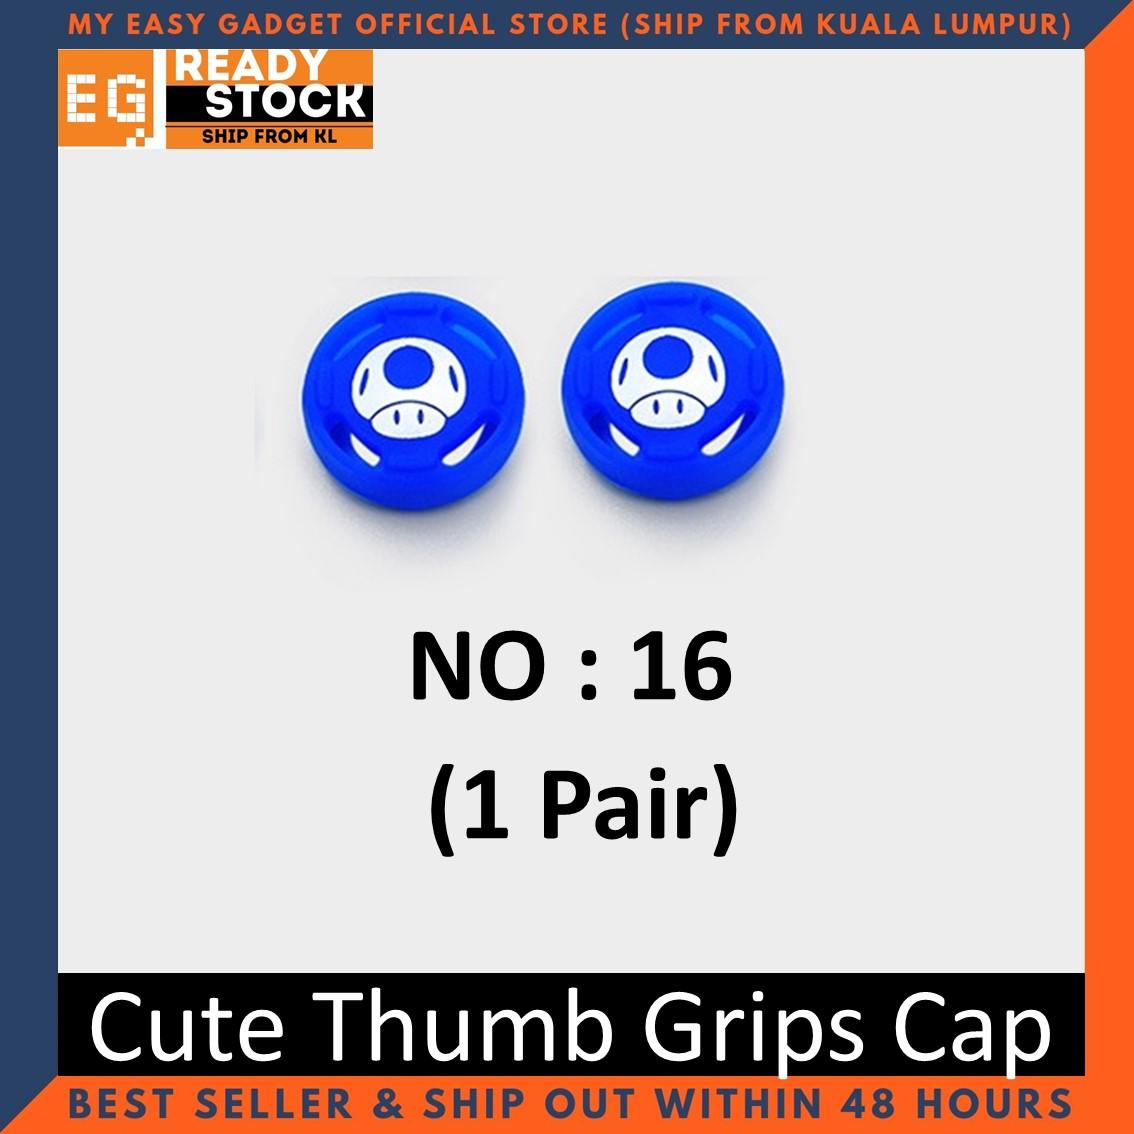 Nintendo Switch Thump Grip Cute Mario Pikachu Splatoon Silicone Analog Thumb Grips Cap for Joy-con (1 Pair)